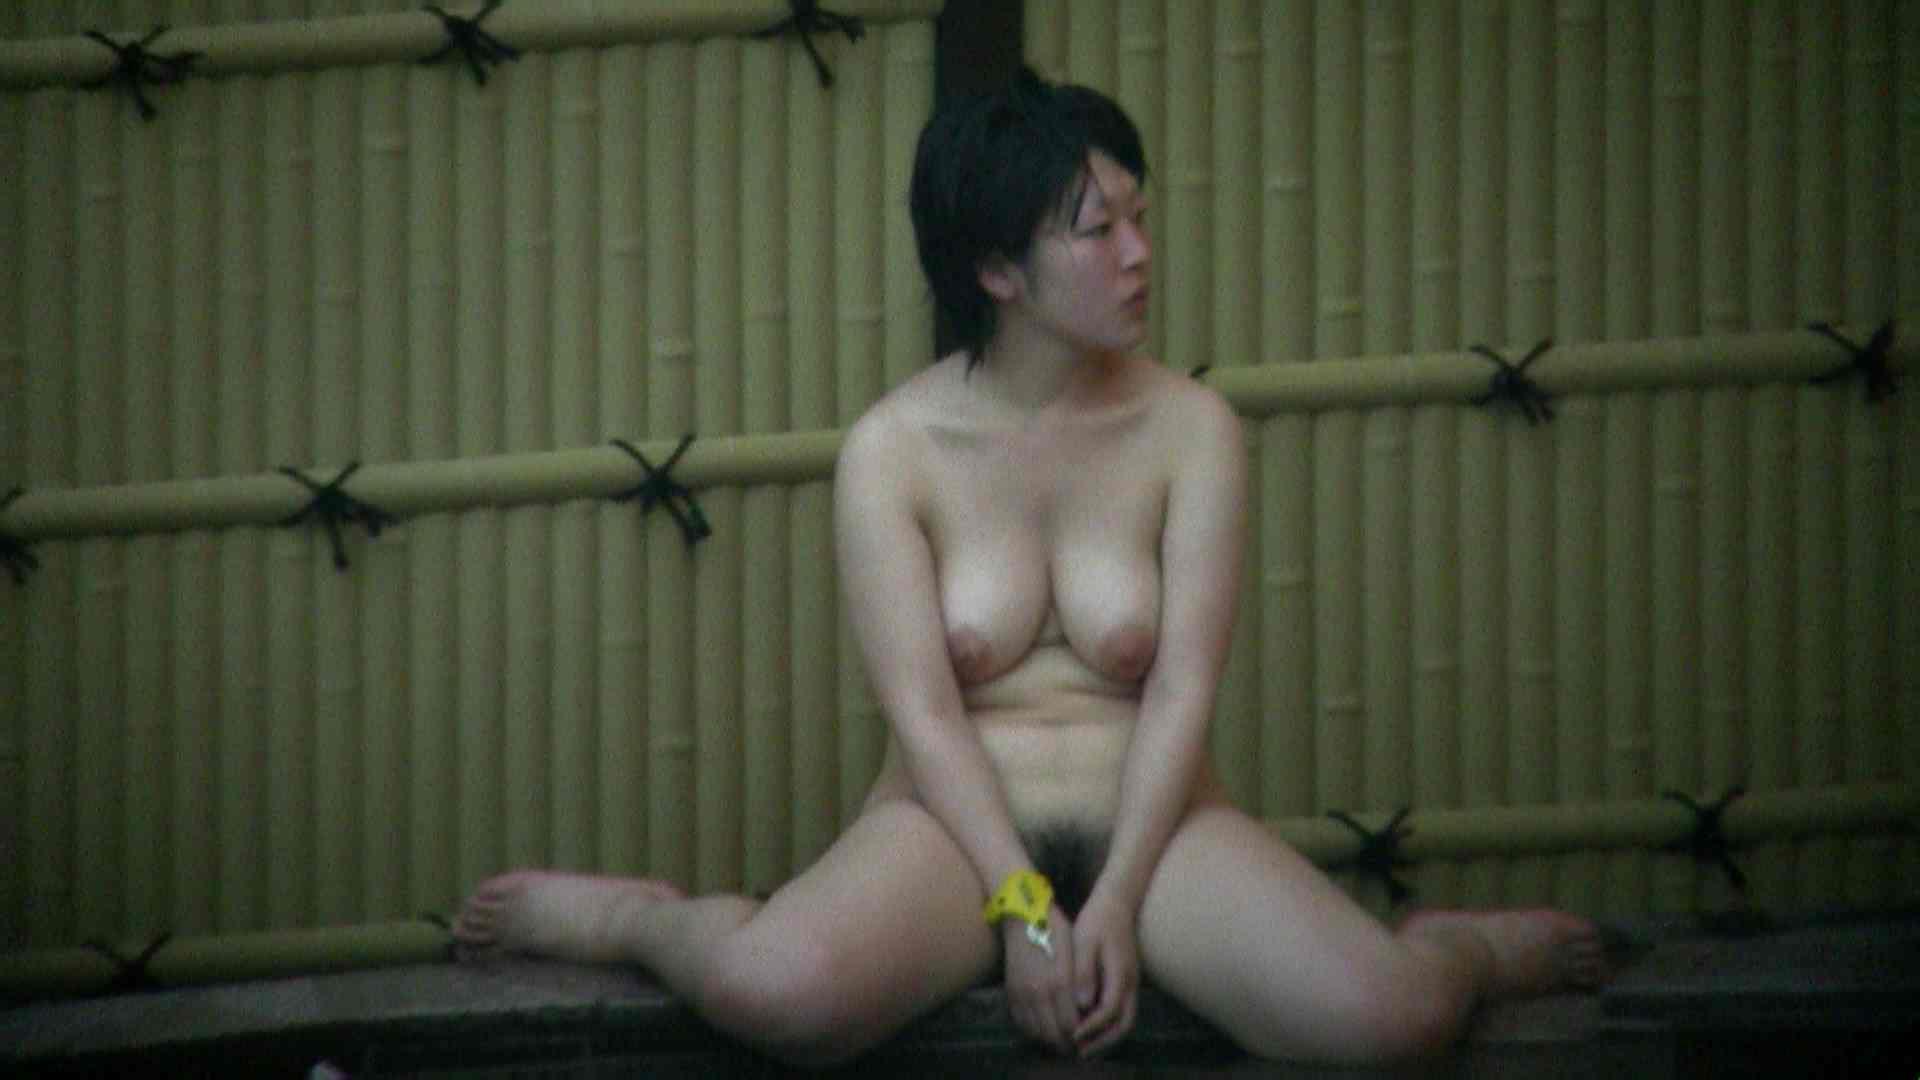 Aquaな露天風呂Vol.05【VIP】 盗撮大放出 エロ画像 65連発 19